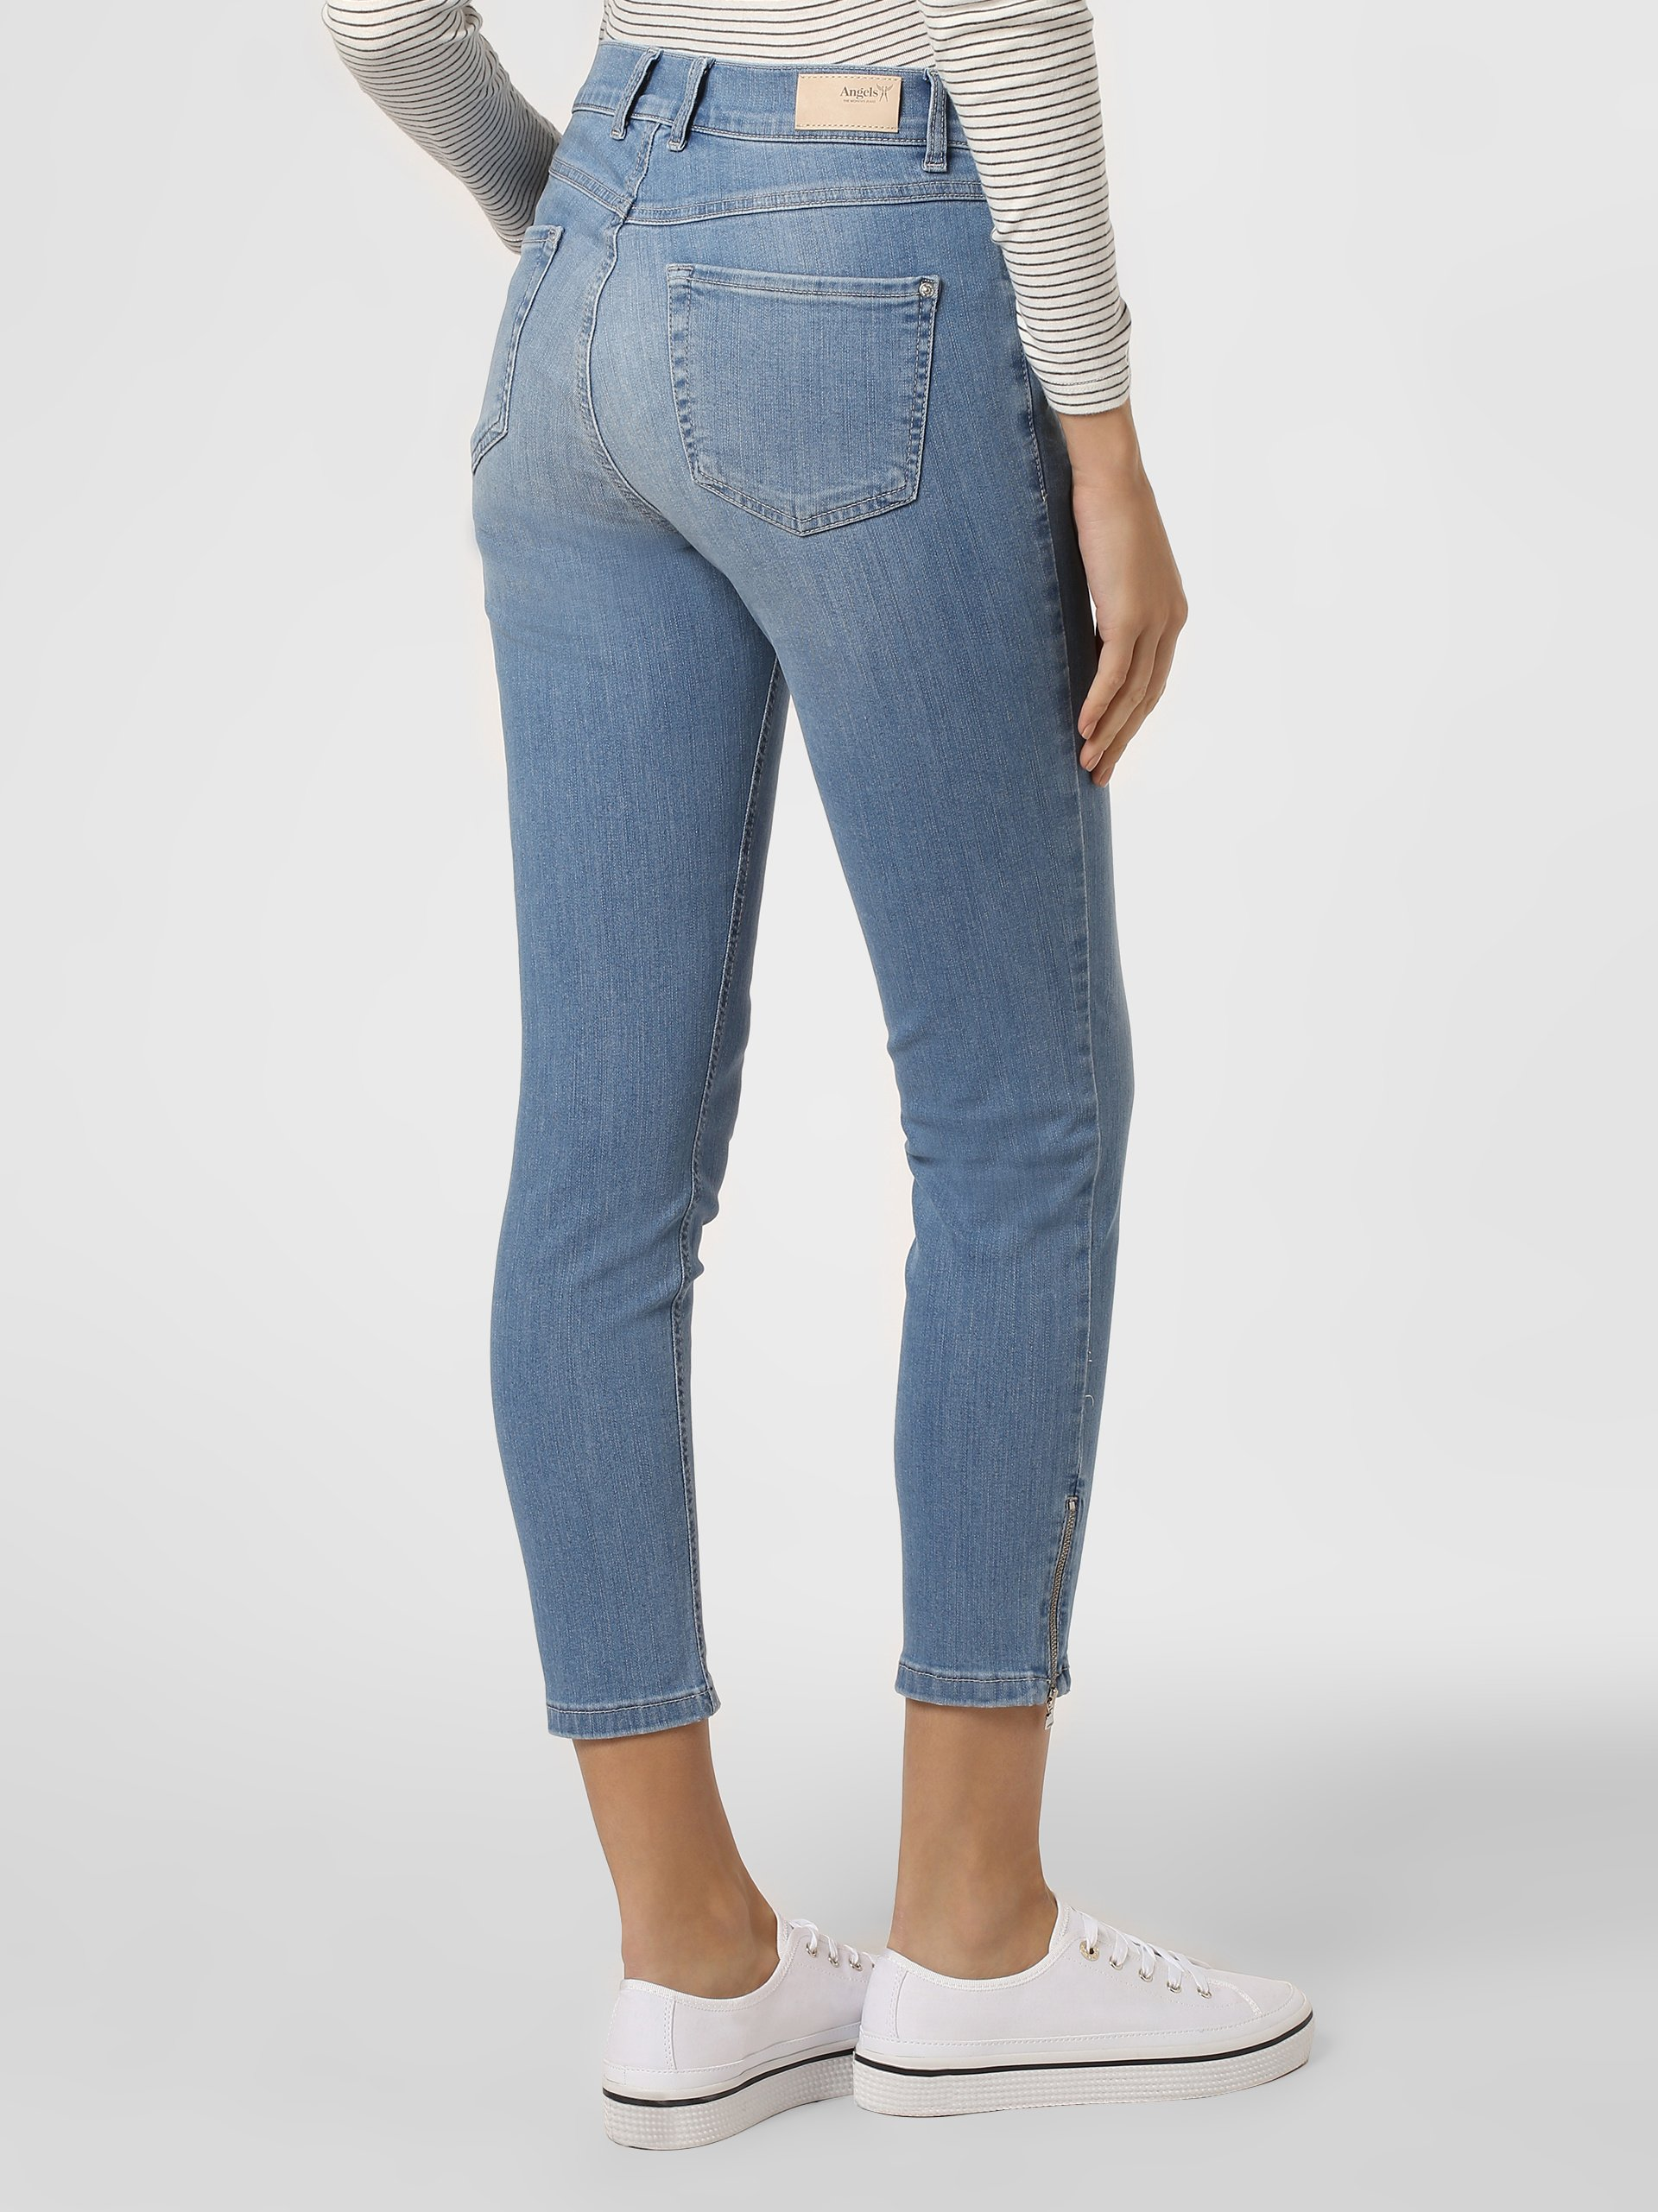 Angels Damen Jeans - Ankle Zip